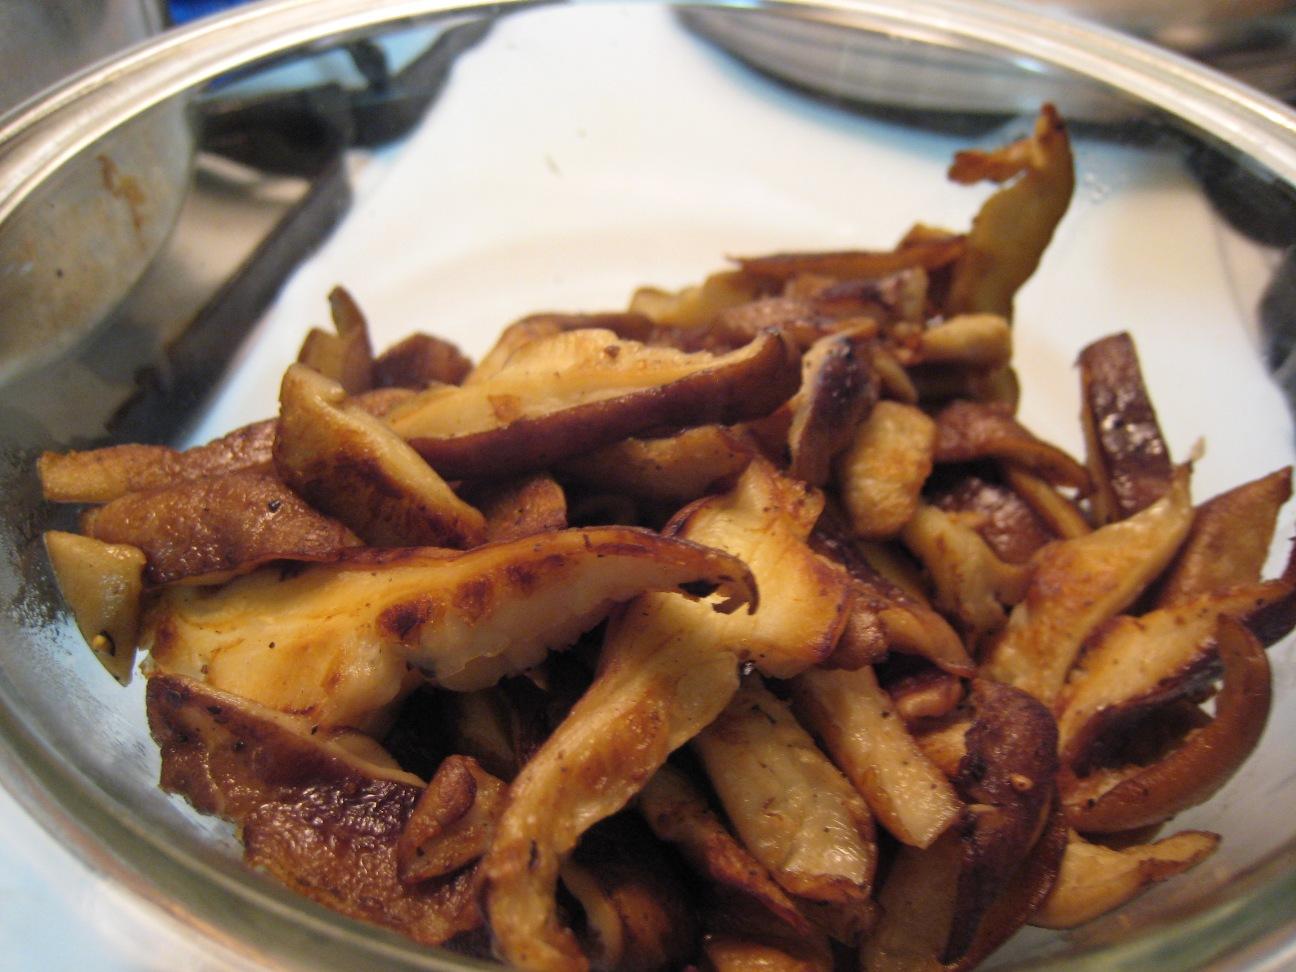 Global Grub: Risotto with Shiitake, Asparagus, and Artichoke